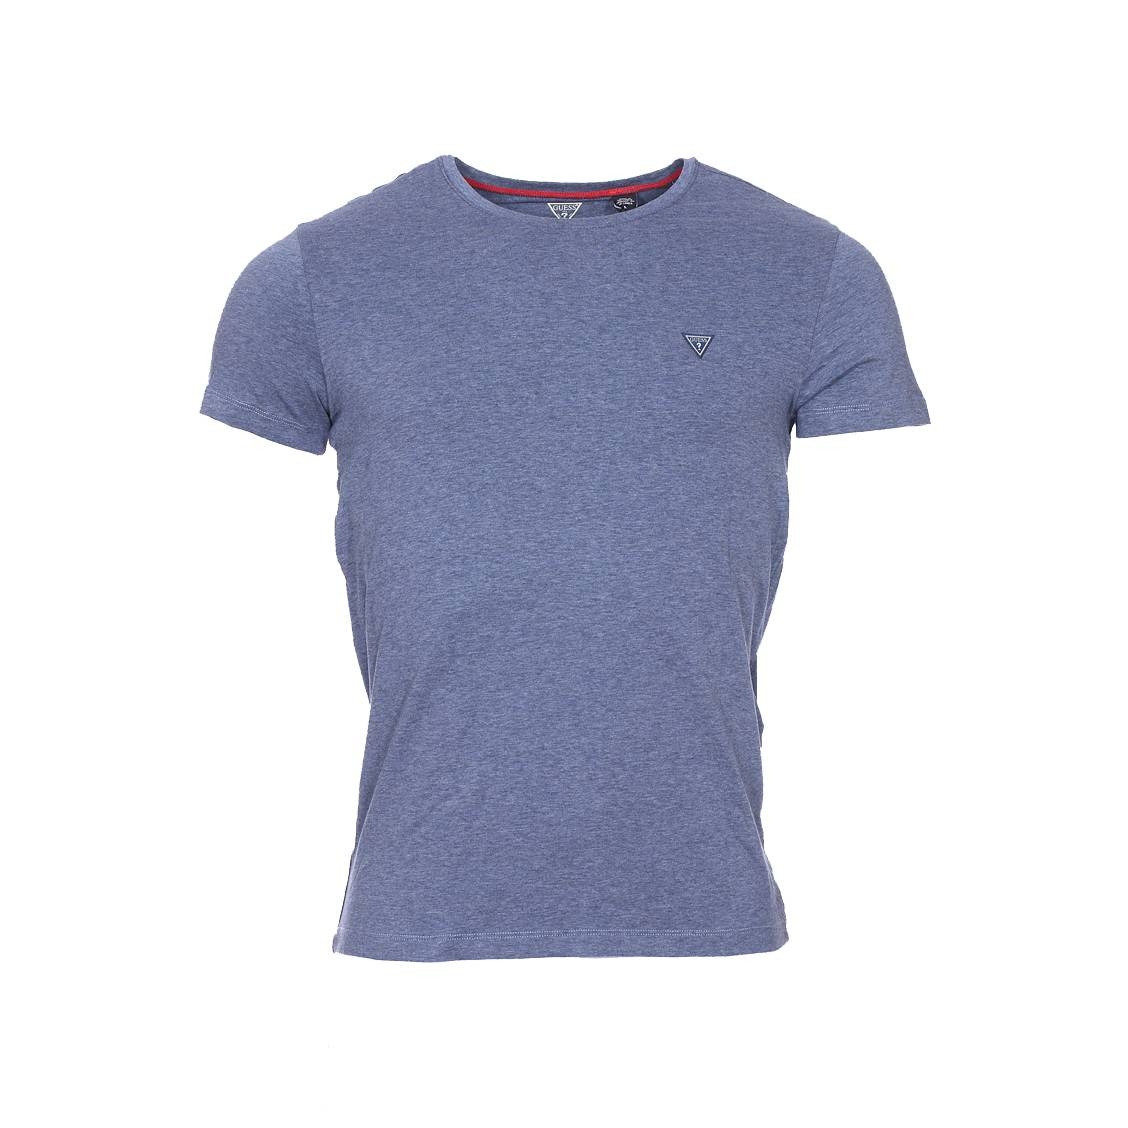 Tee-shirt col rond guess en coton stretch bleu chiné